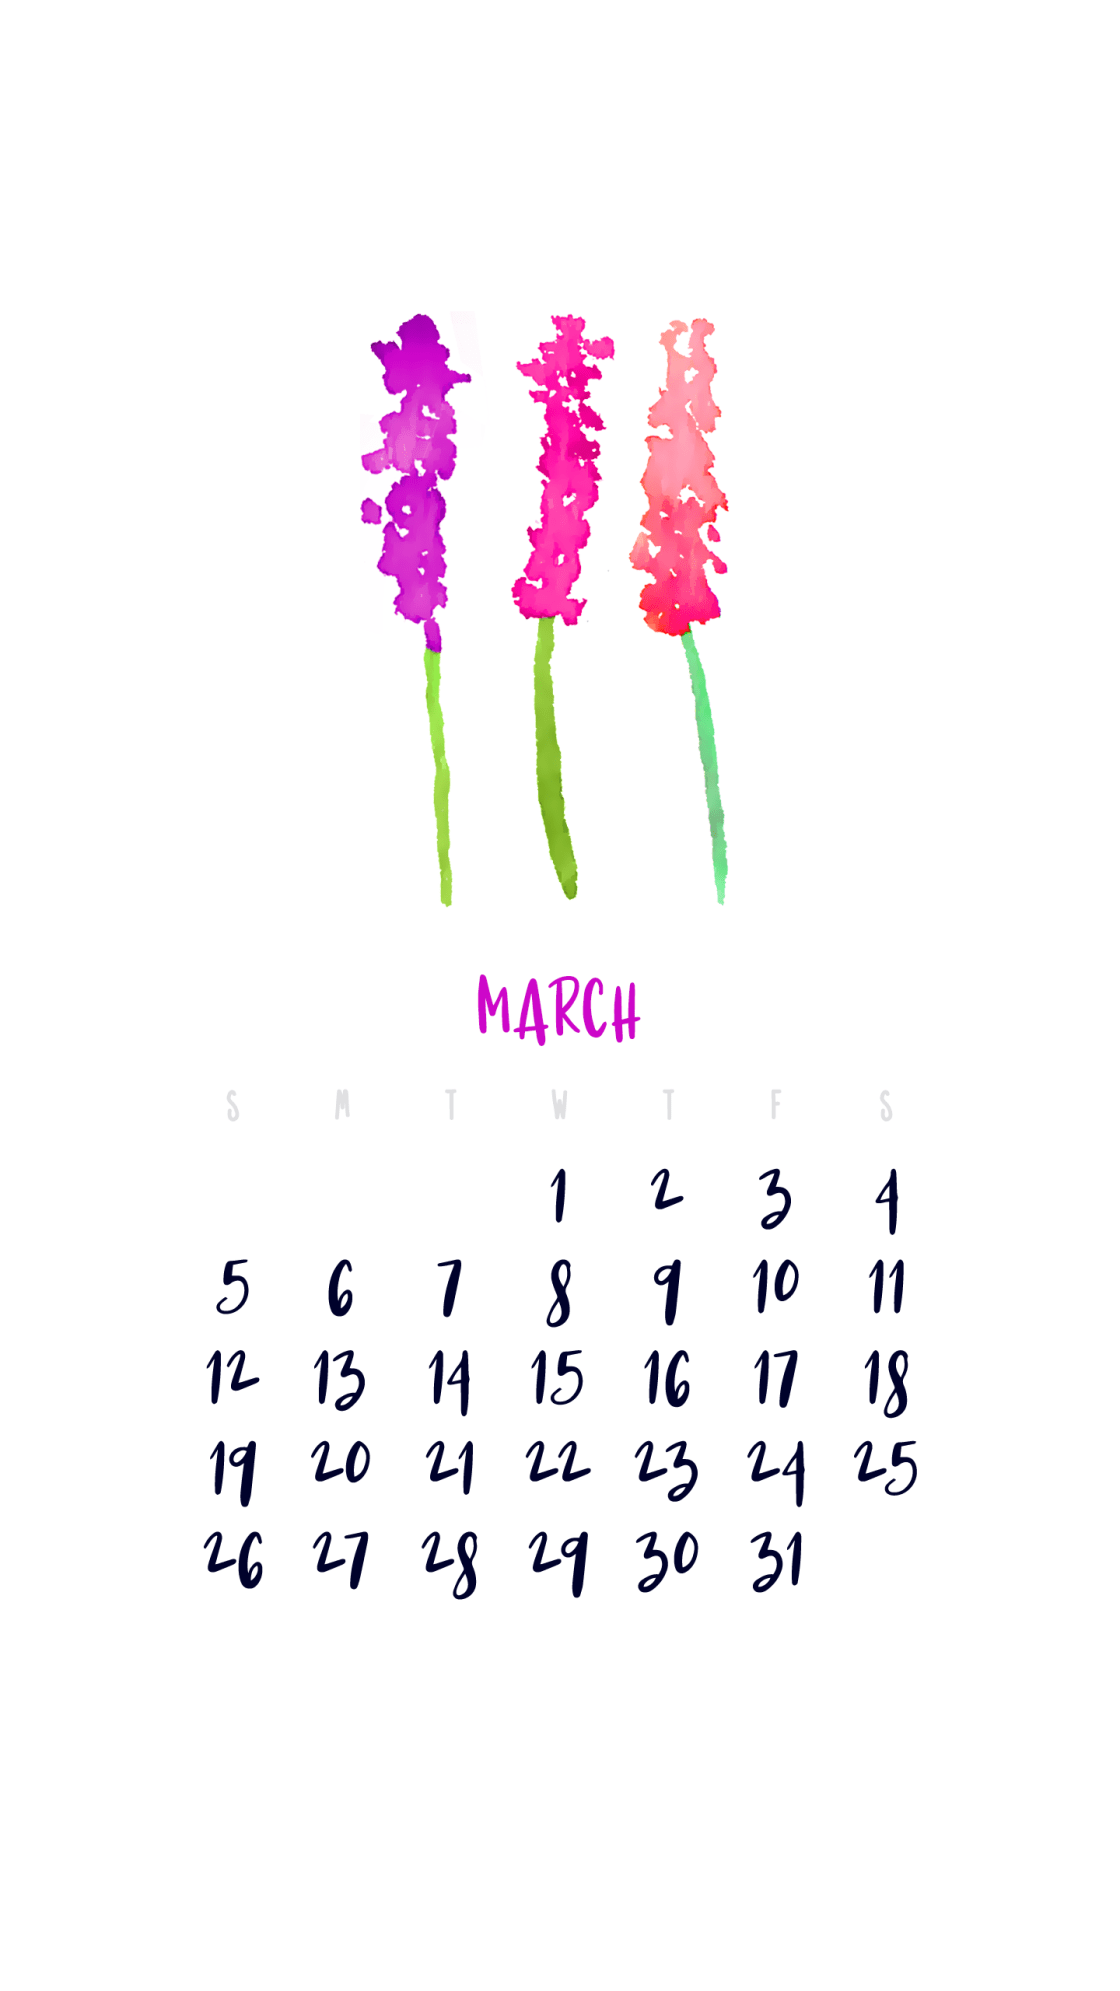 I Try DIY | March 2017 Smartphone Wallpaper Calendar